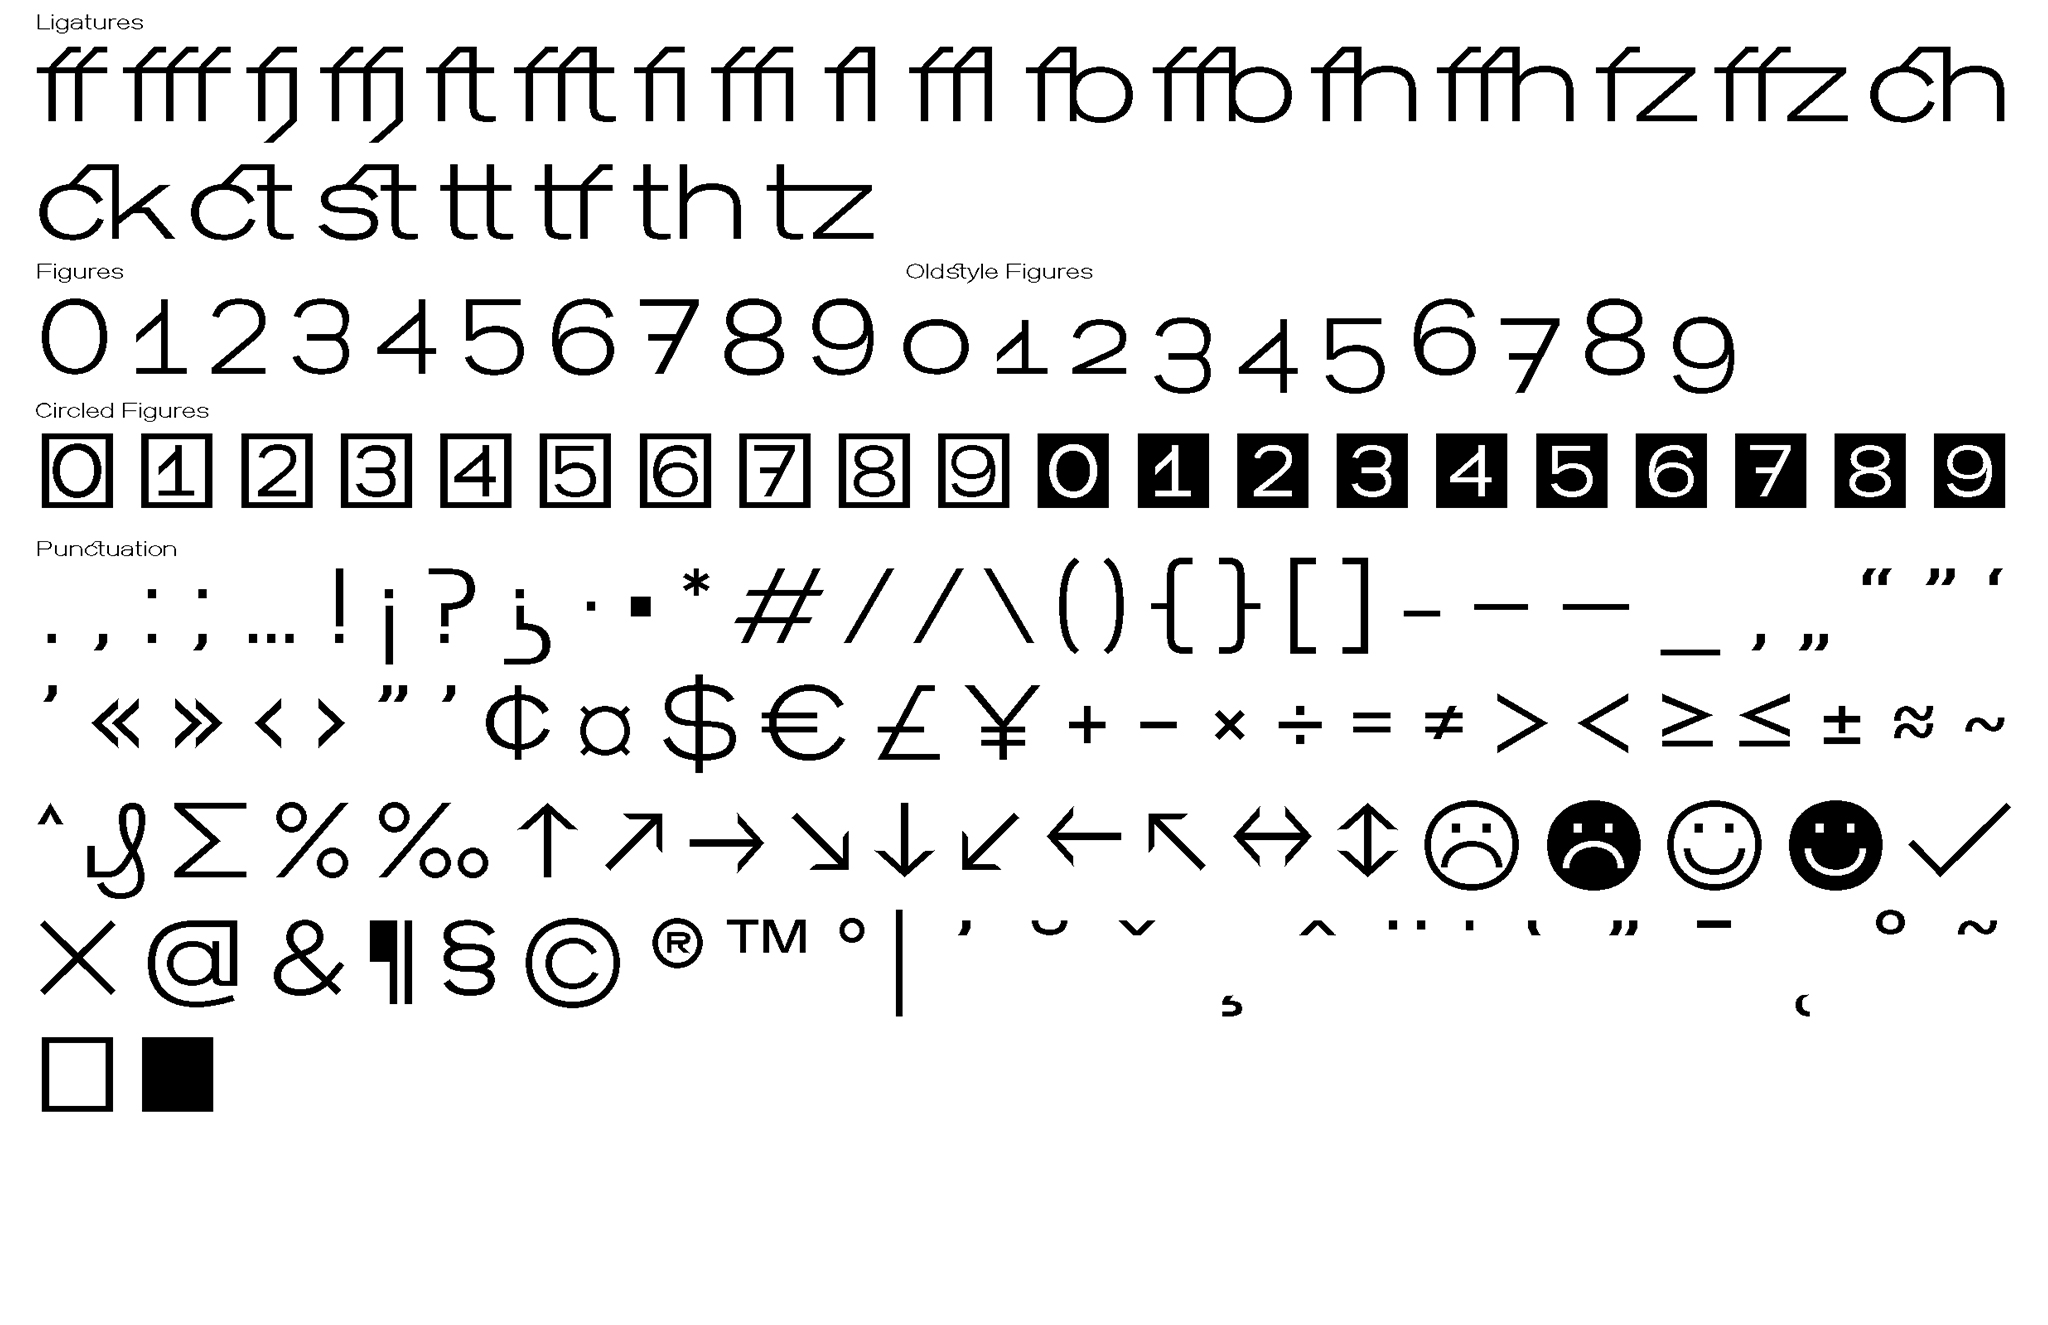 Kritik Typeface Glyphs Overview